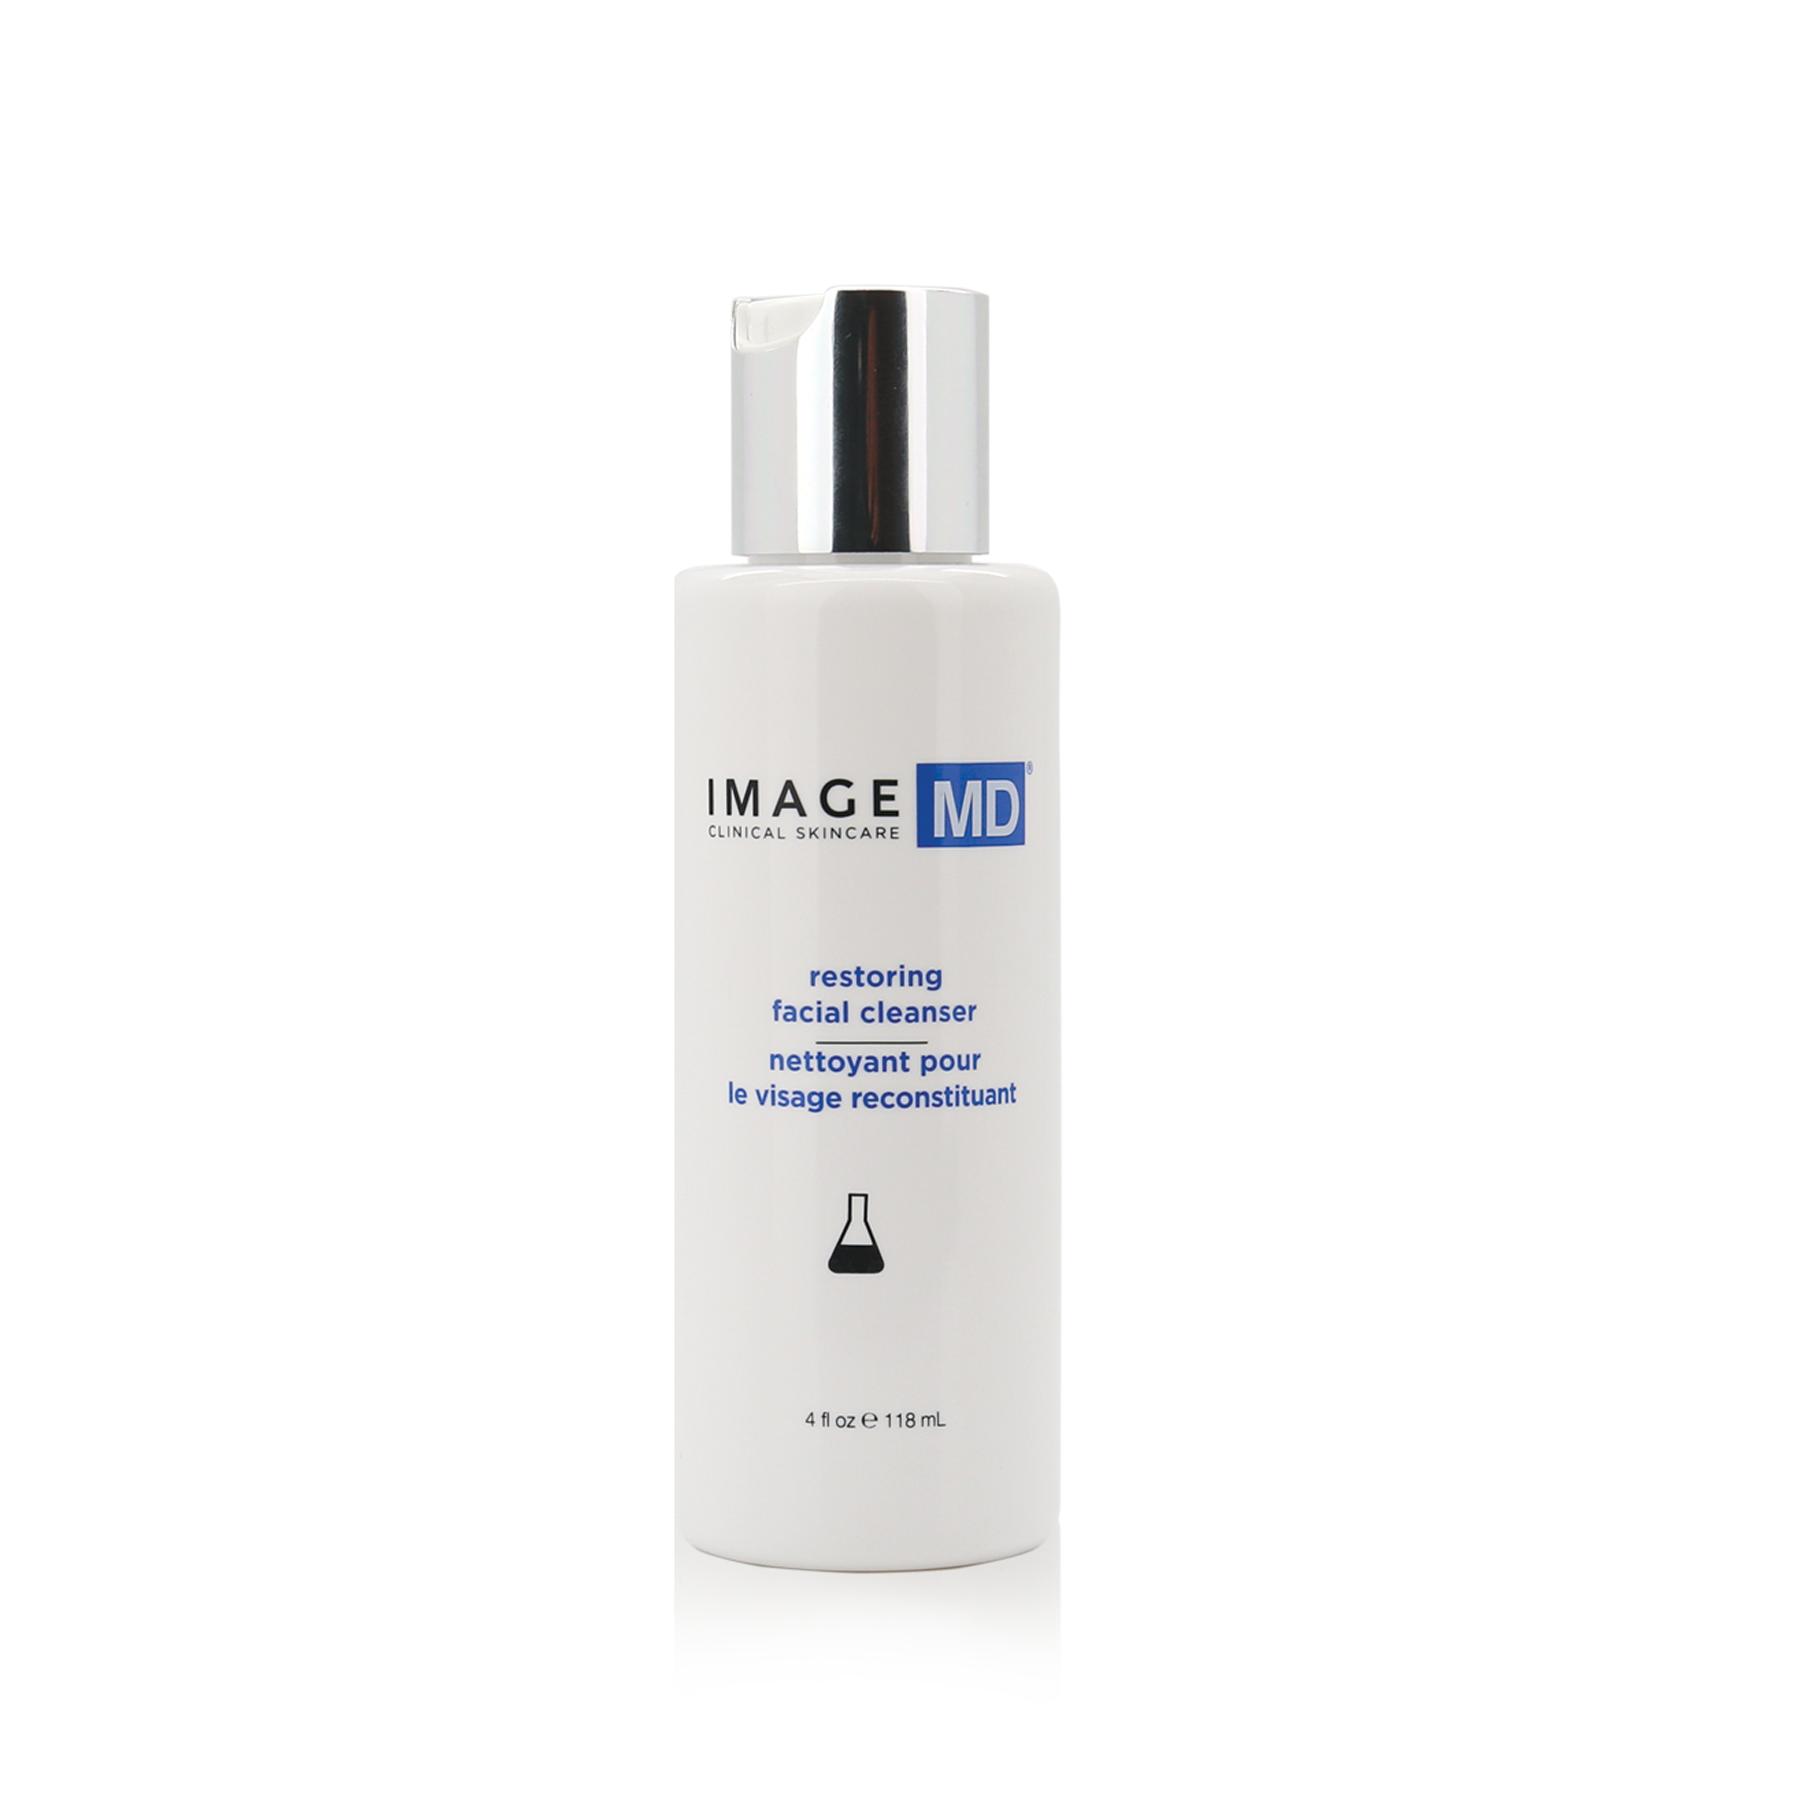 Image Skincare IMAGE MD Restoring Facial Cleanser